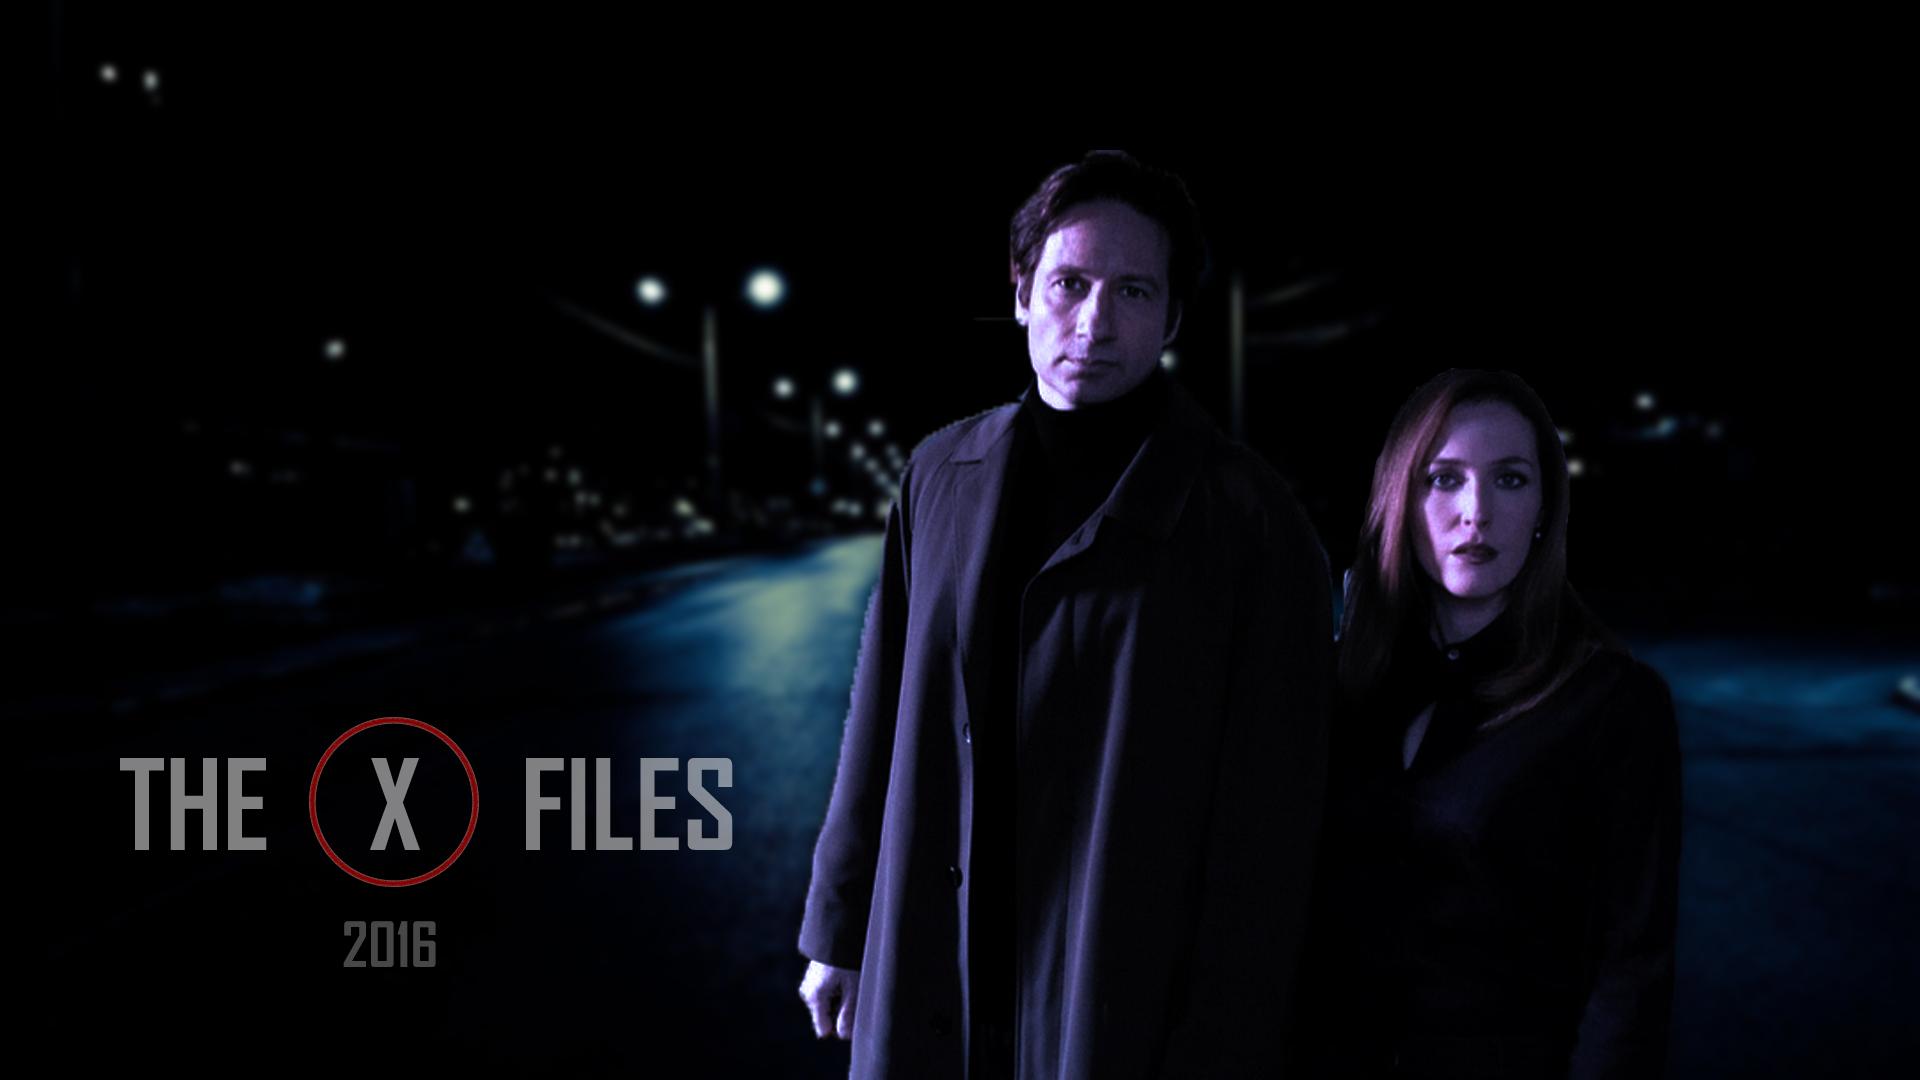 x-files-new-trailer.jpg